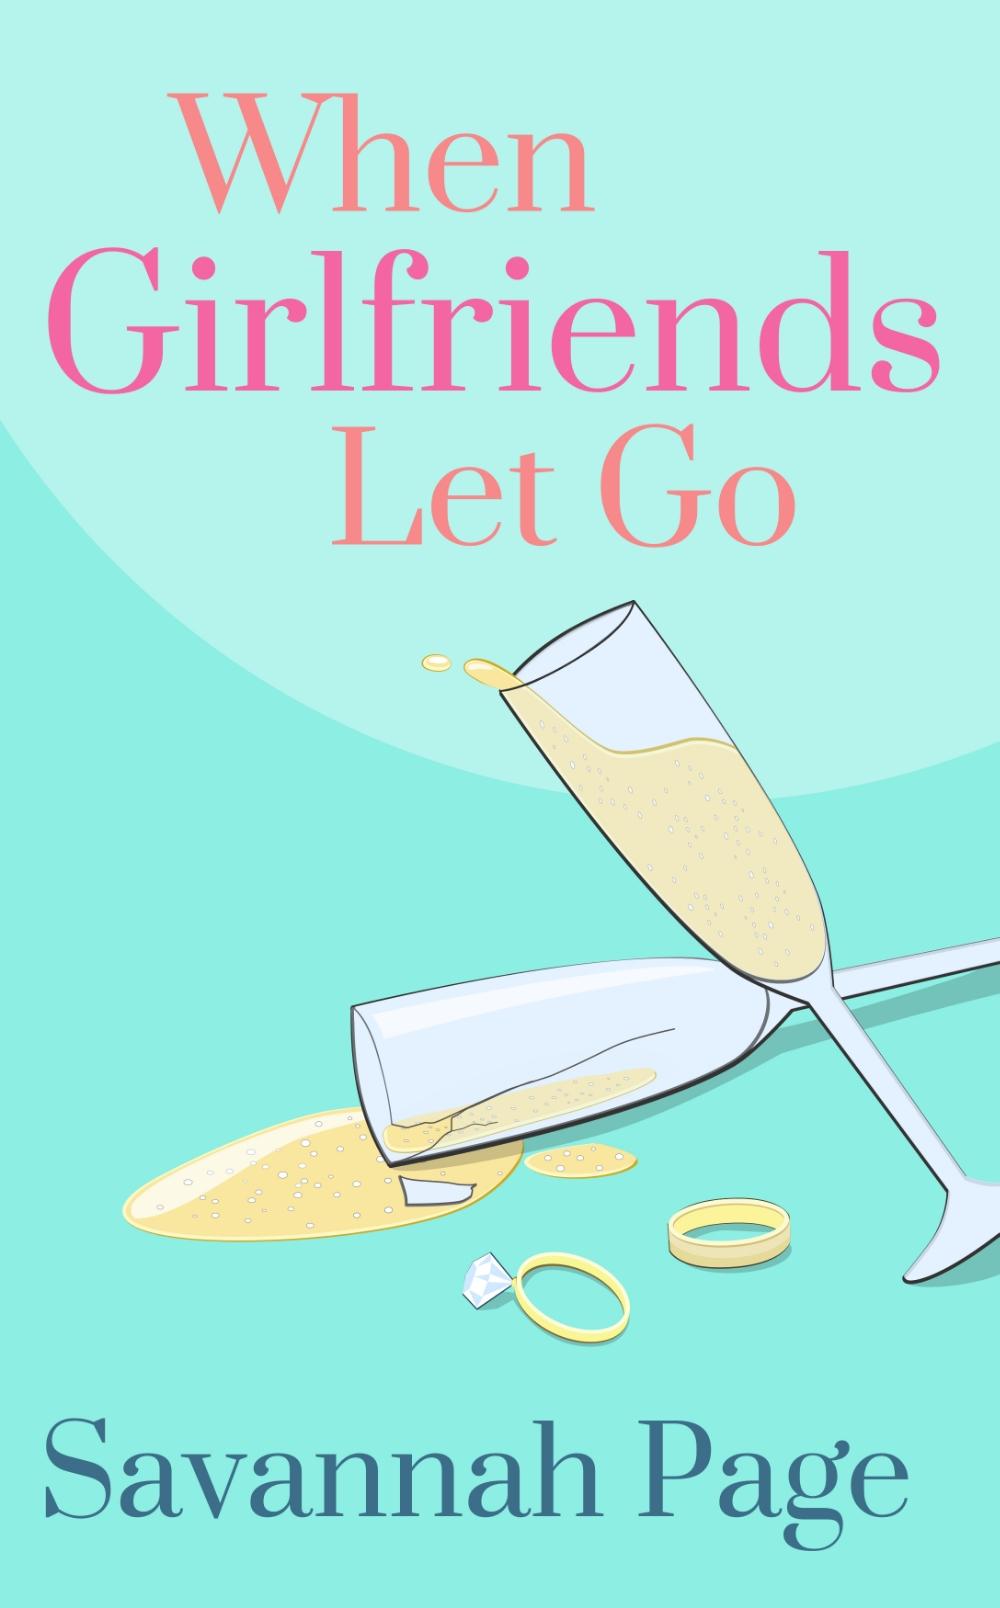 When Girlfriends Let Go - EBOOK iTunes